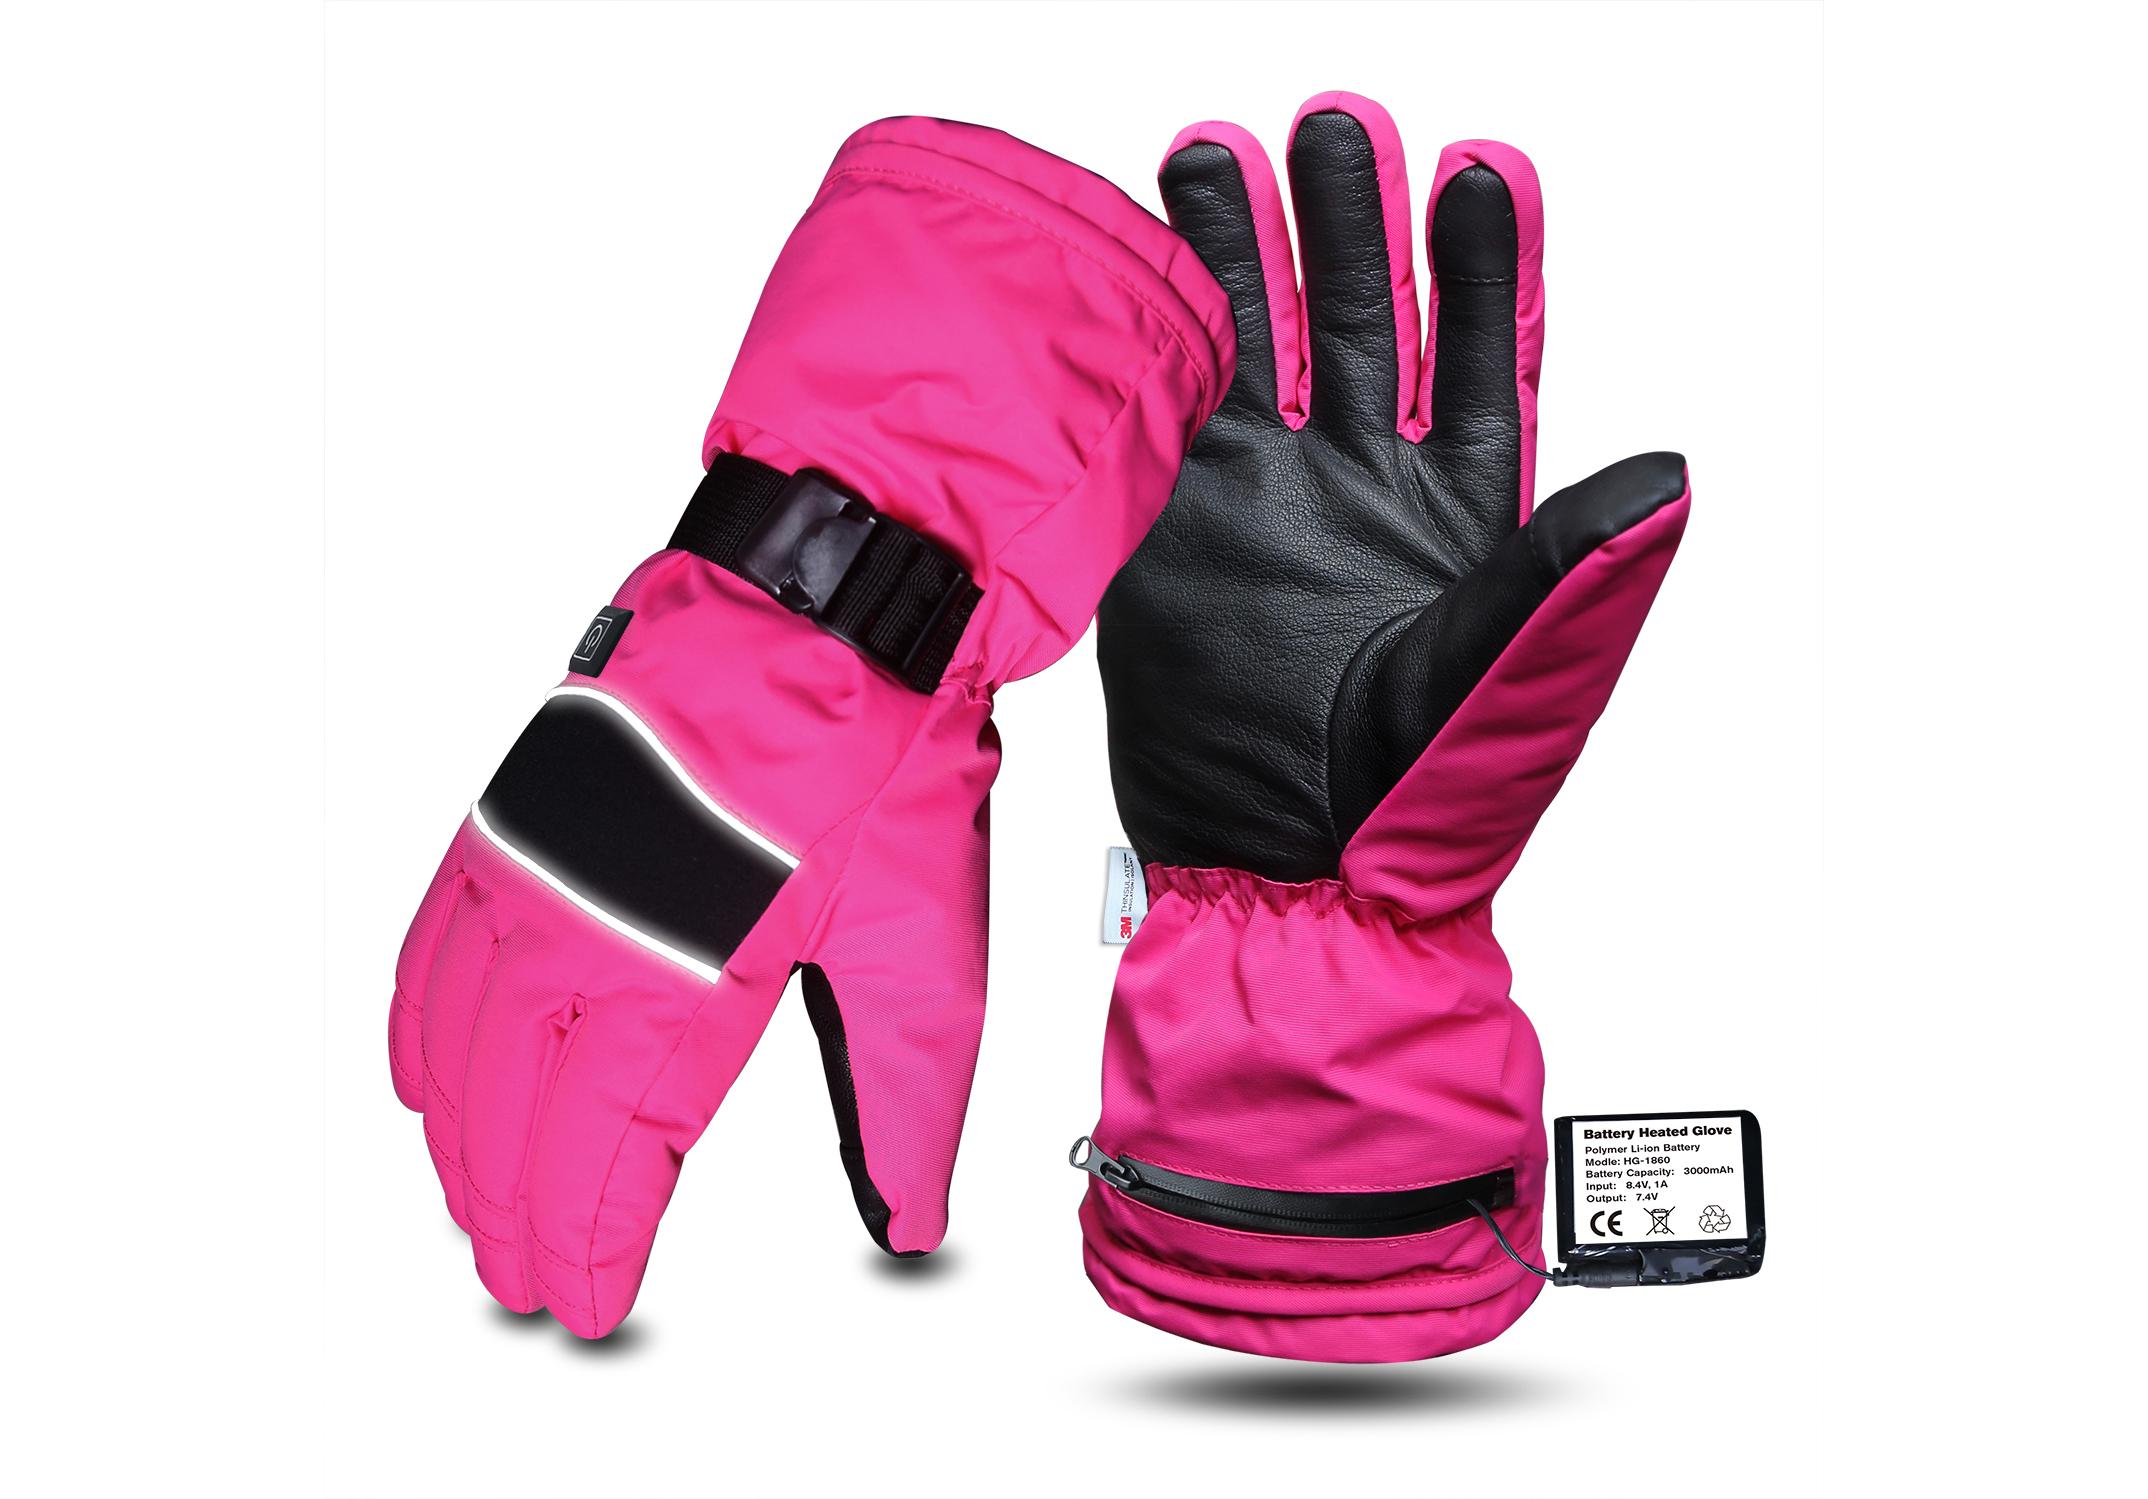 Motorcycle Glove Heating/EHG-004